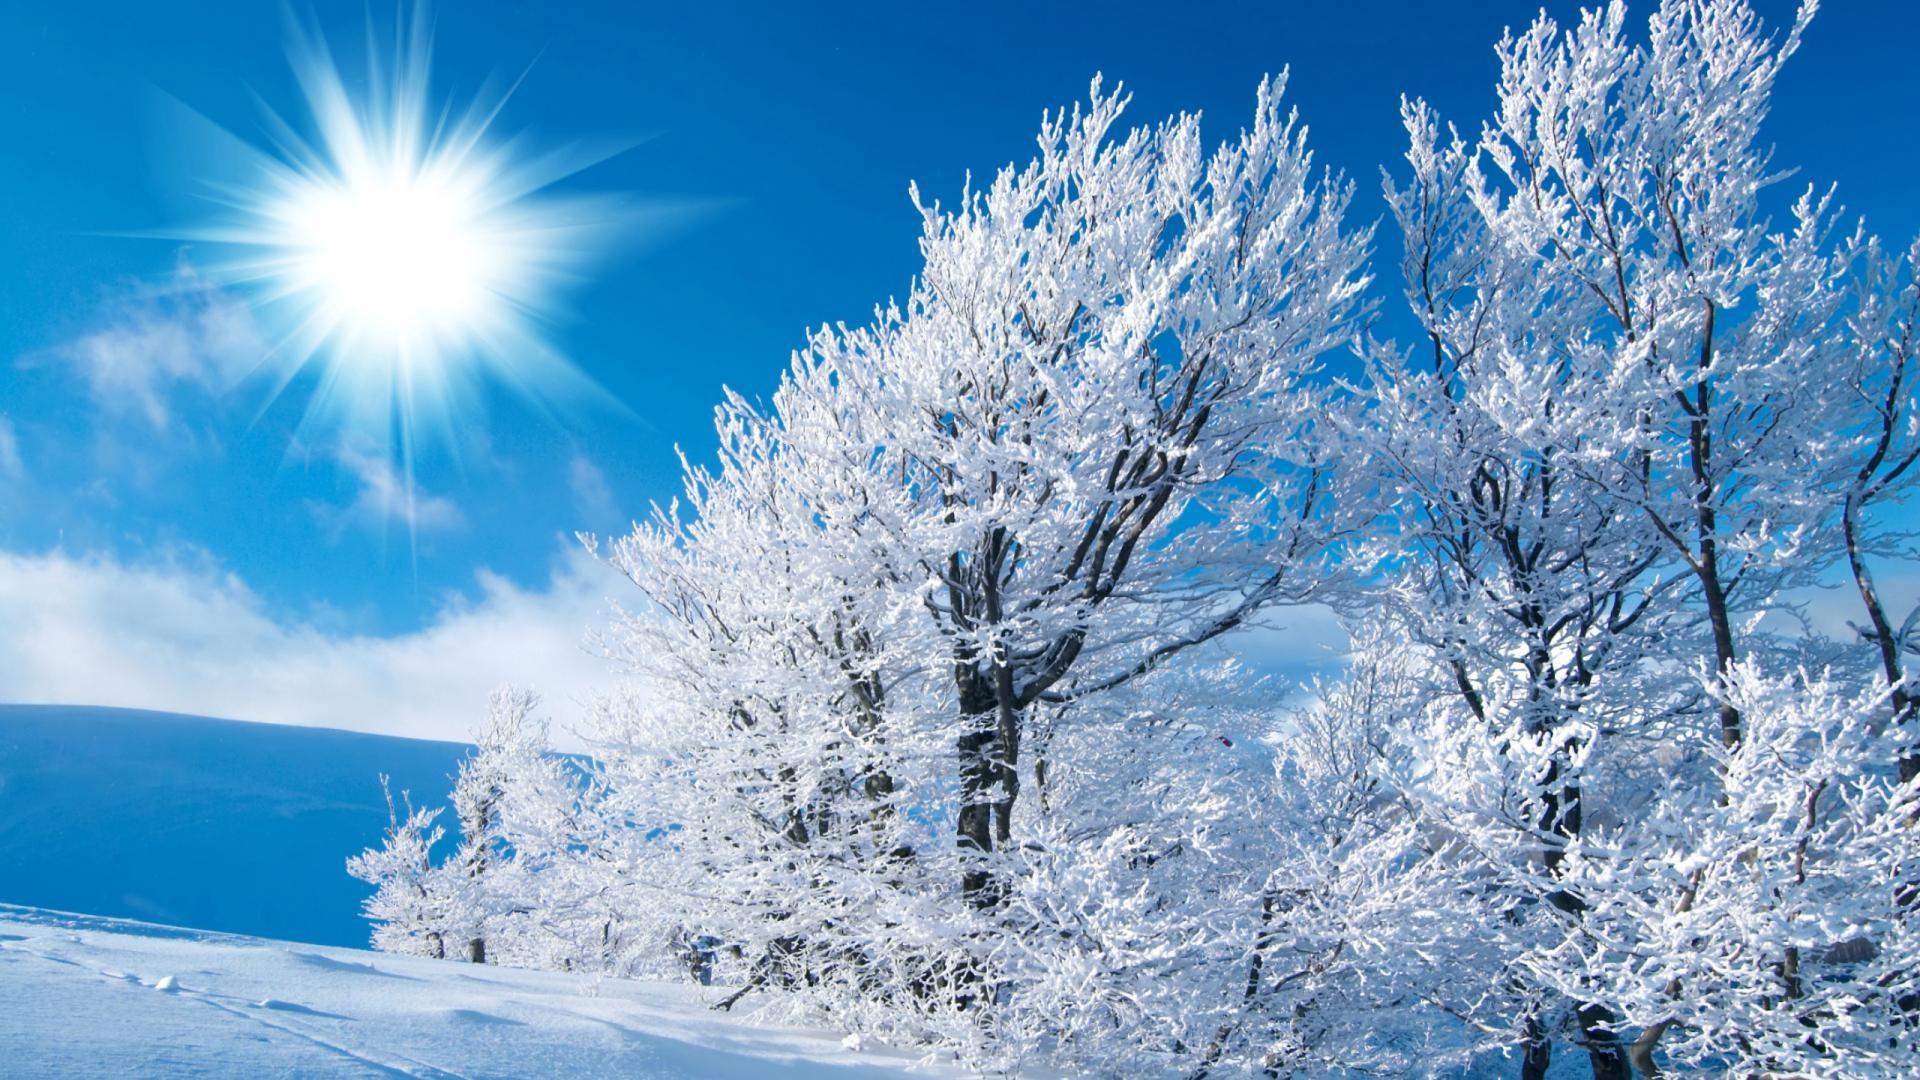 winter-desktop-backgrounds-12.jpg